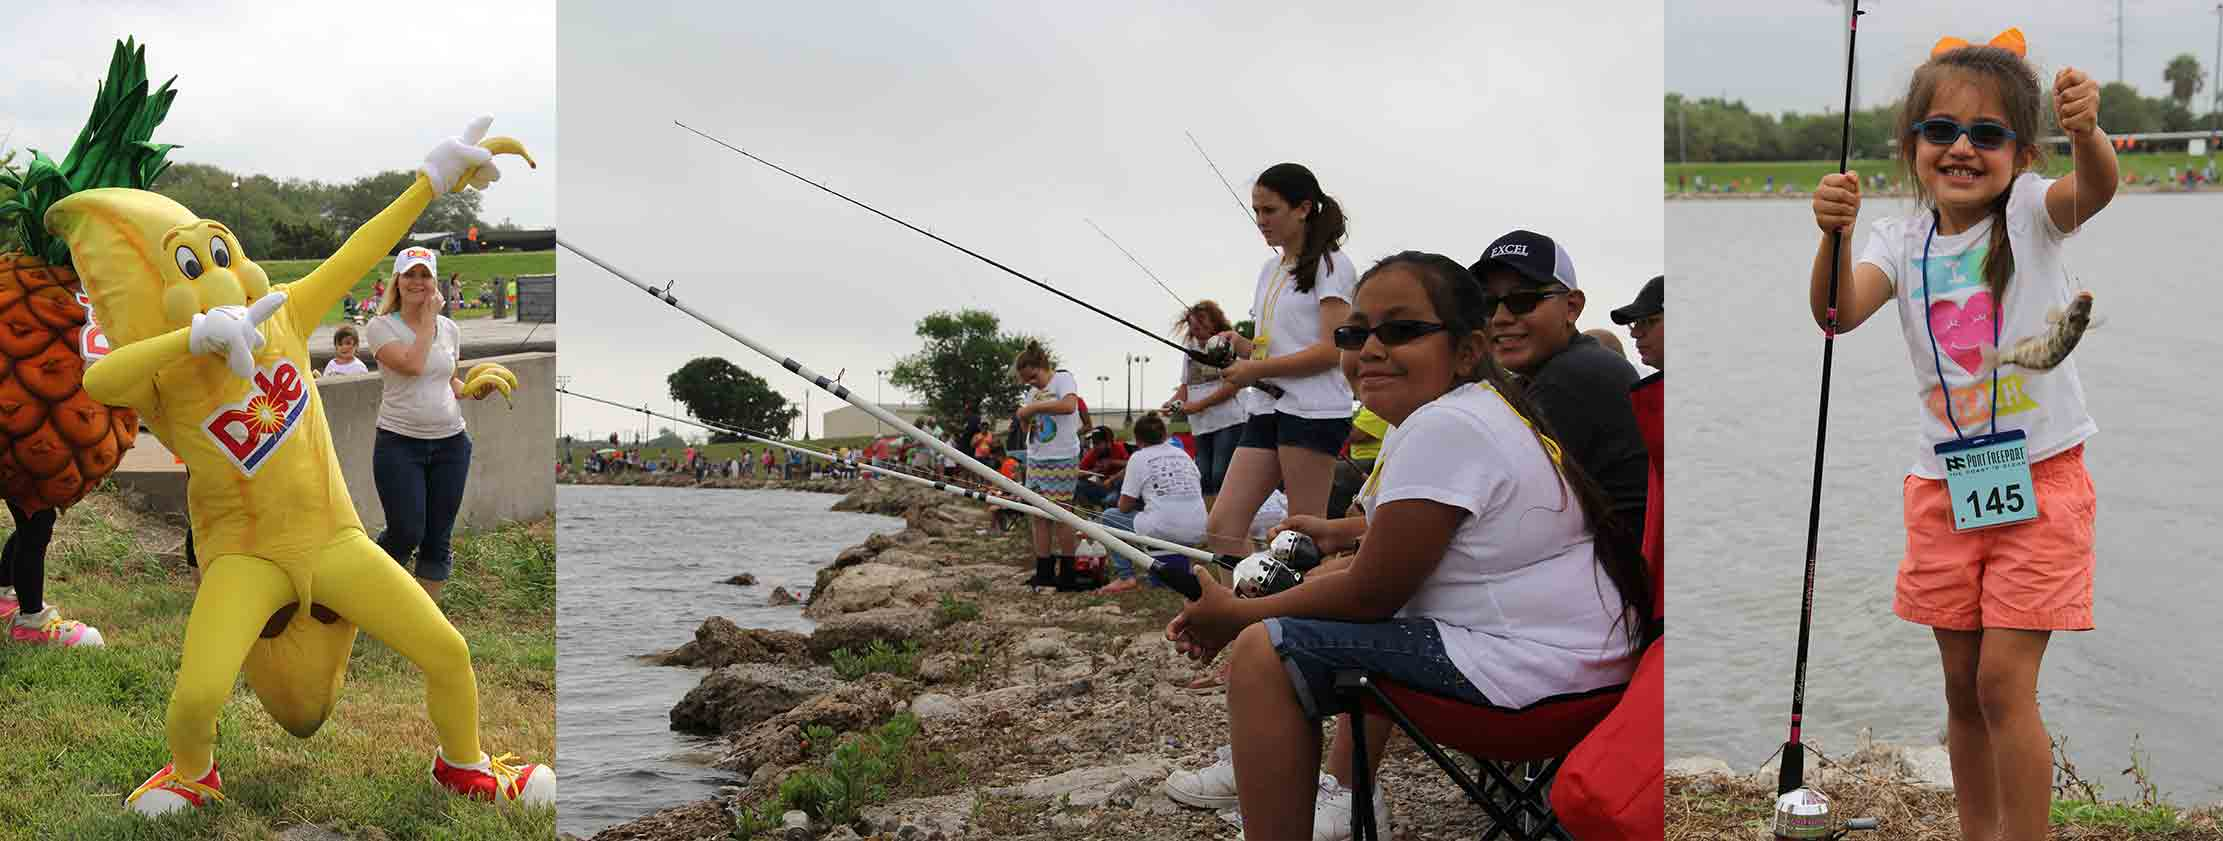 child fishing tournament